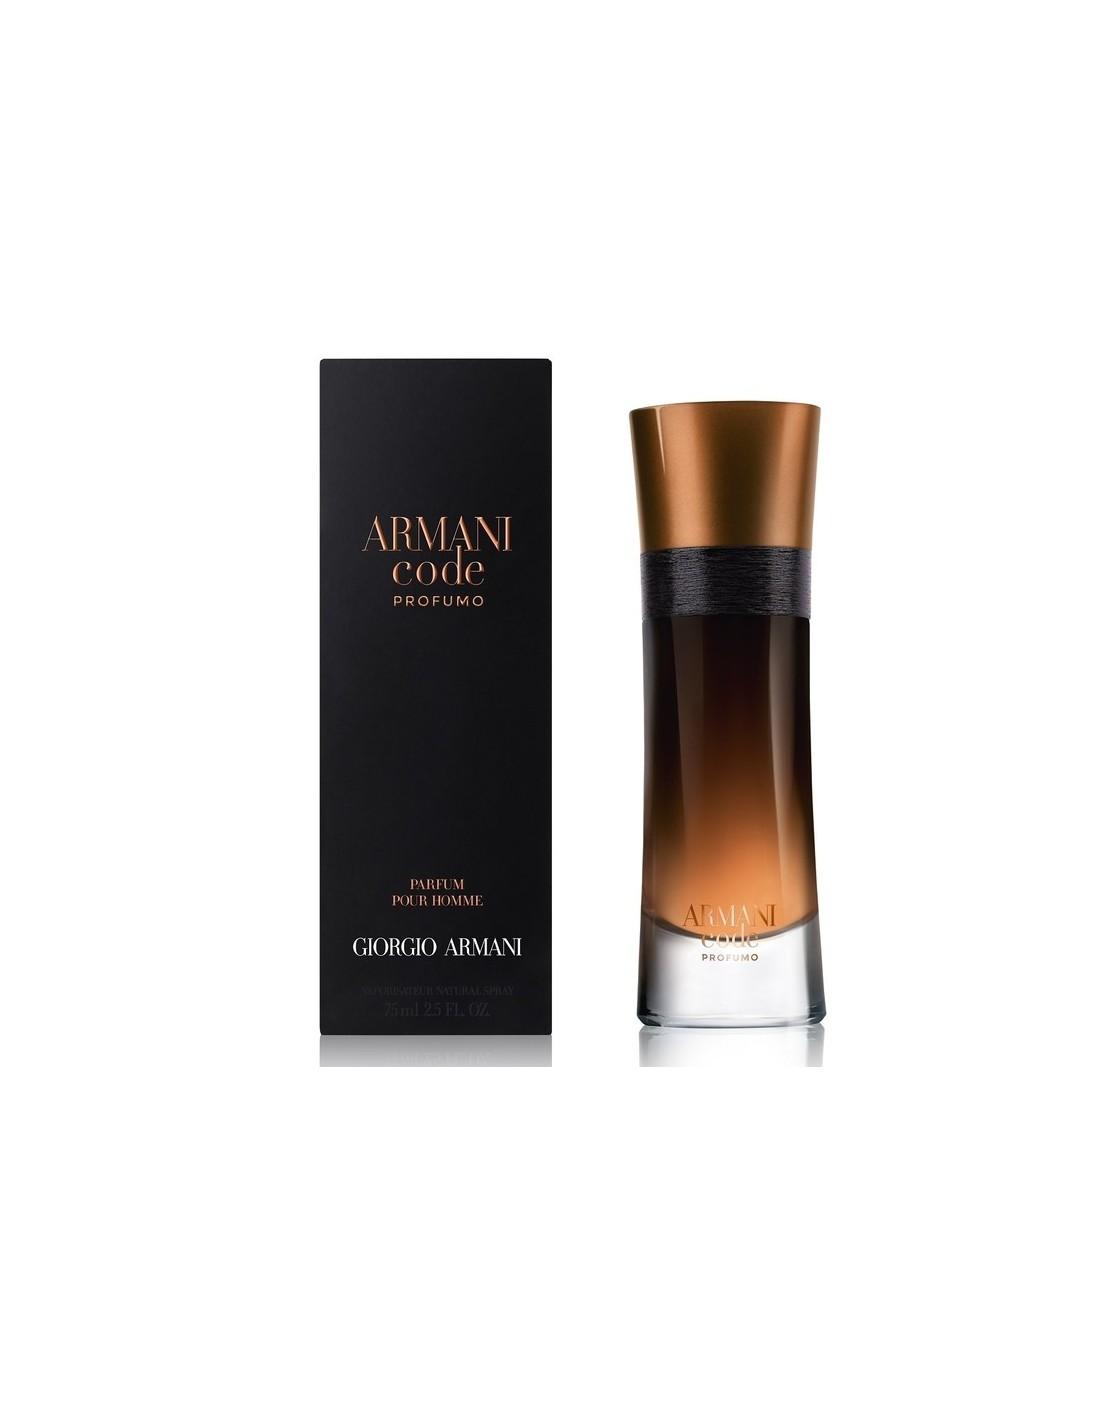 armani code homme profumo eau de parfum 60 ml spray. Black Bedroom Furniture Sets. Home Design Ideas